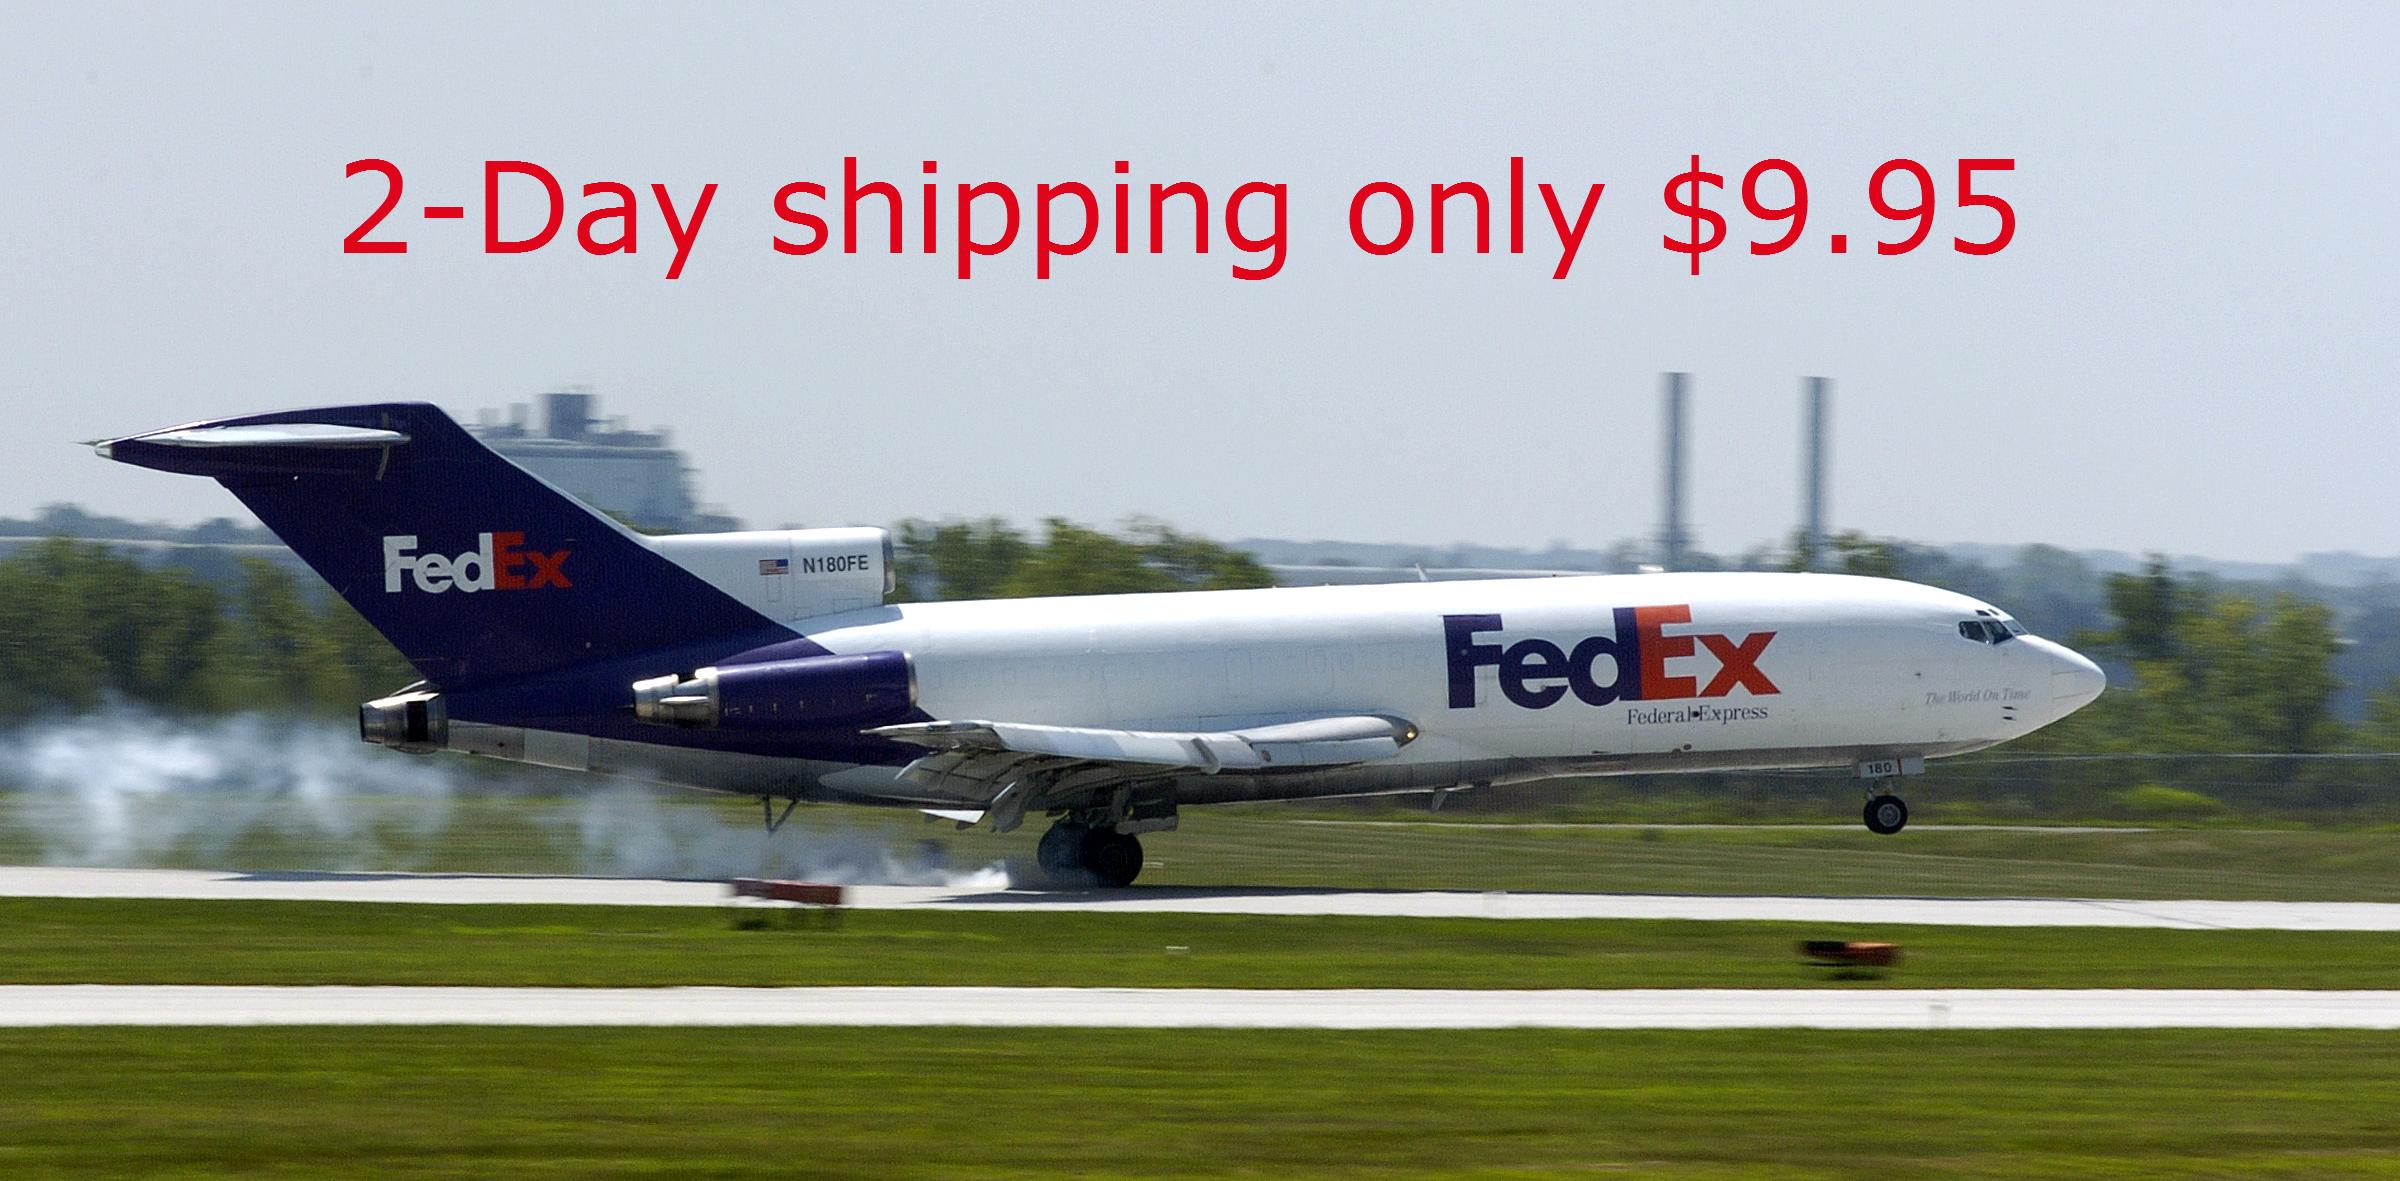 fedex-landing2.jpg